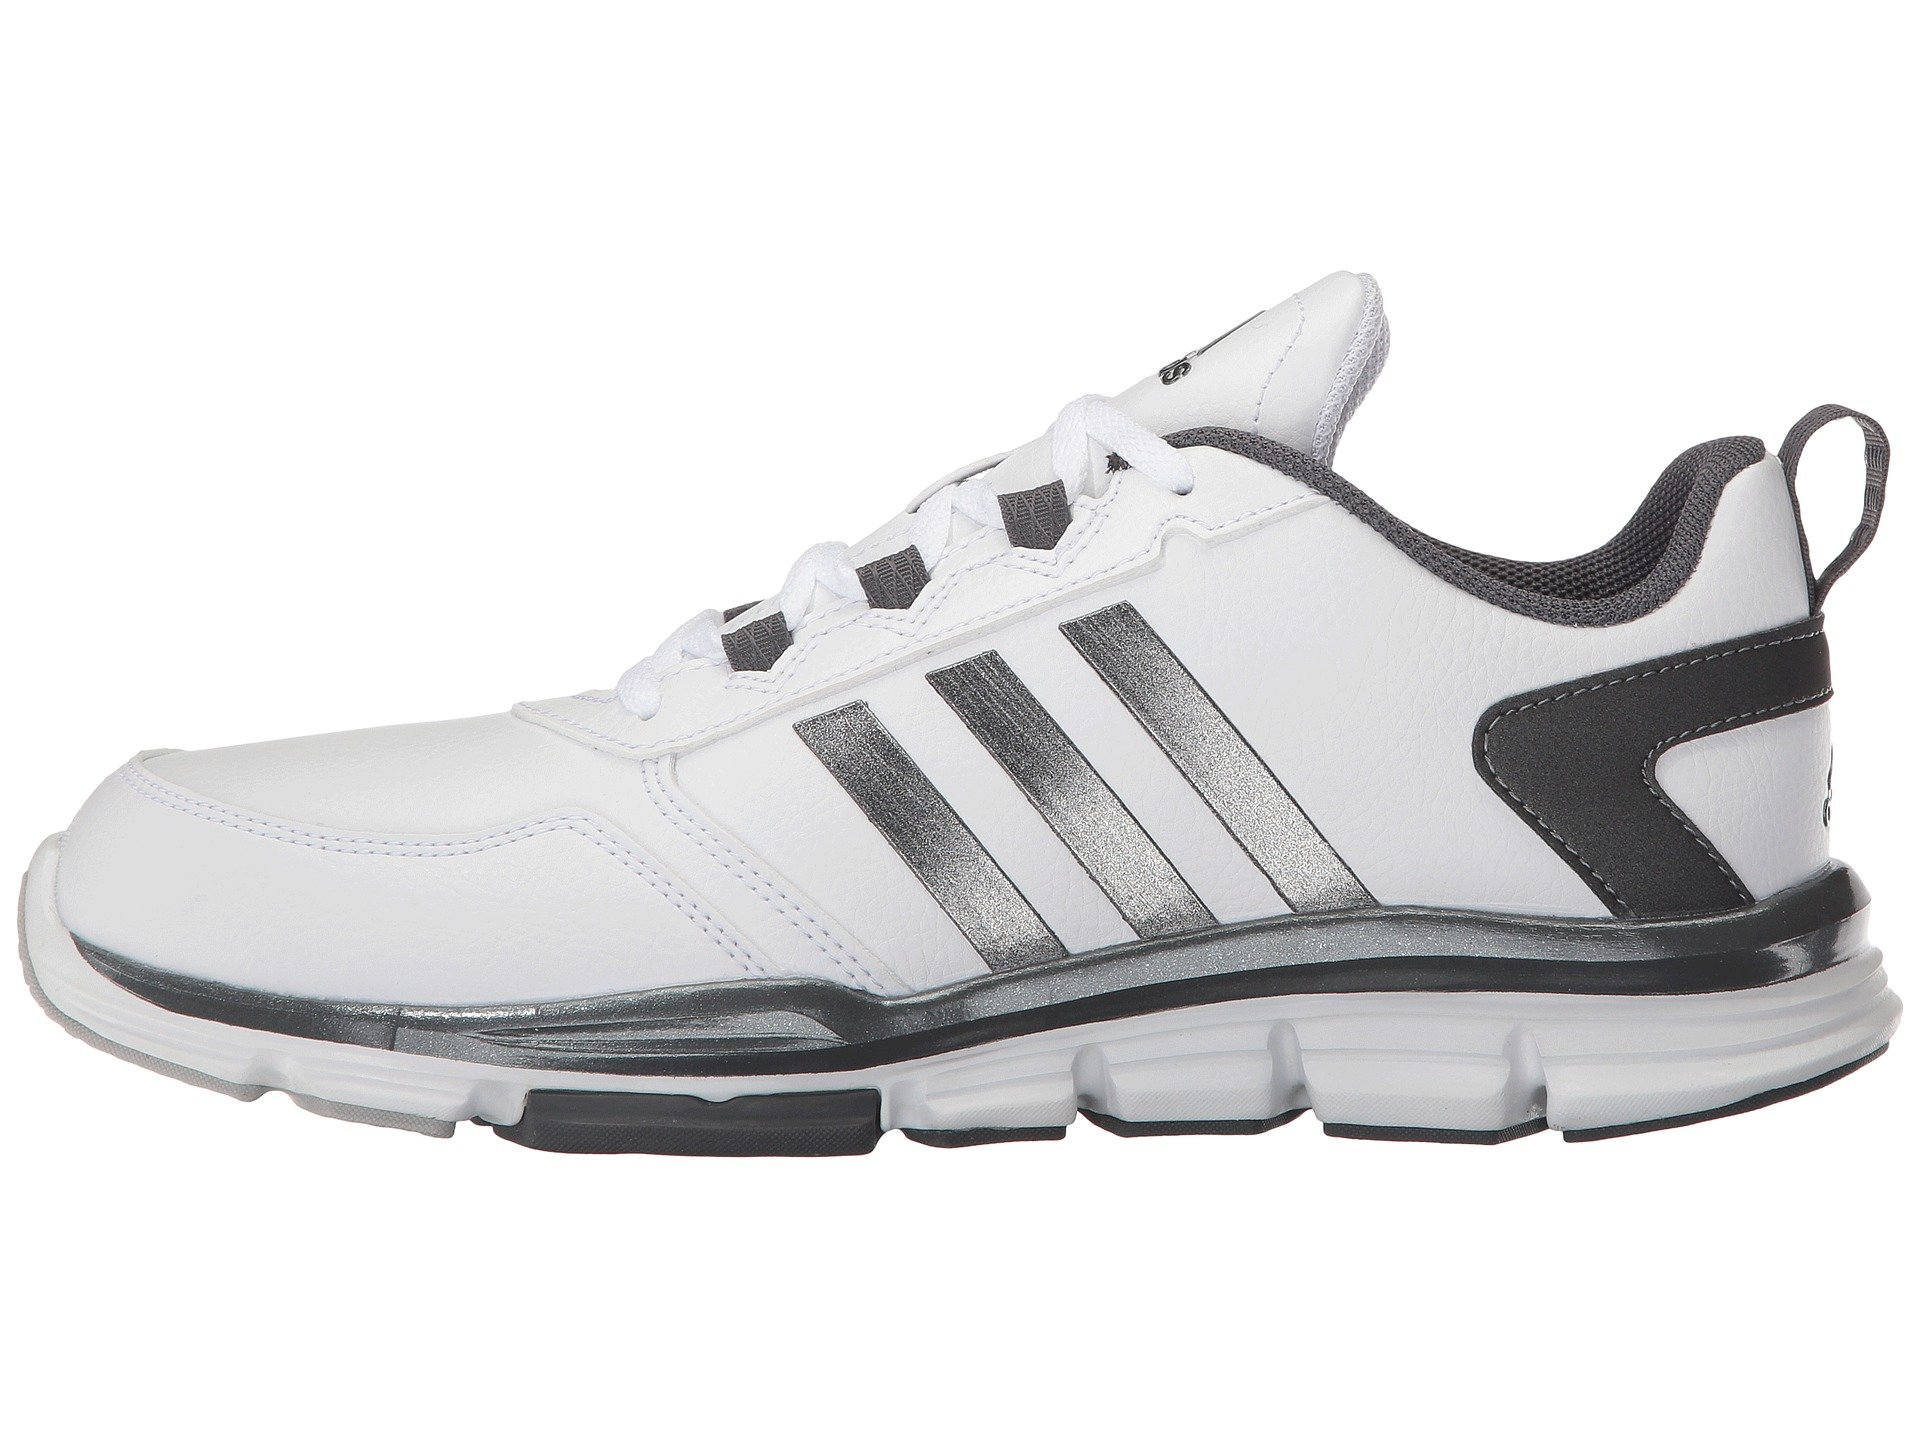 86b6706ab37 Shop Adidas Originals Speed Trainer 2 Slt In White Carbon Metallic Onix